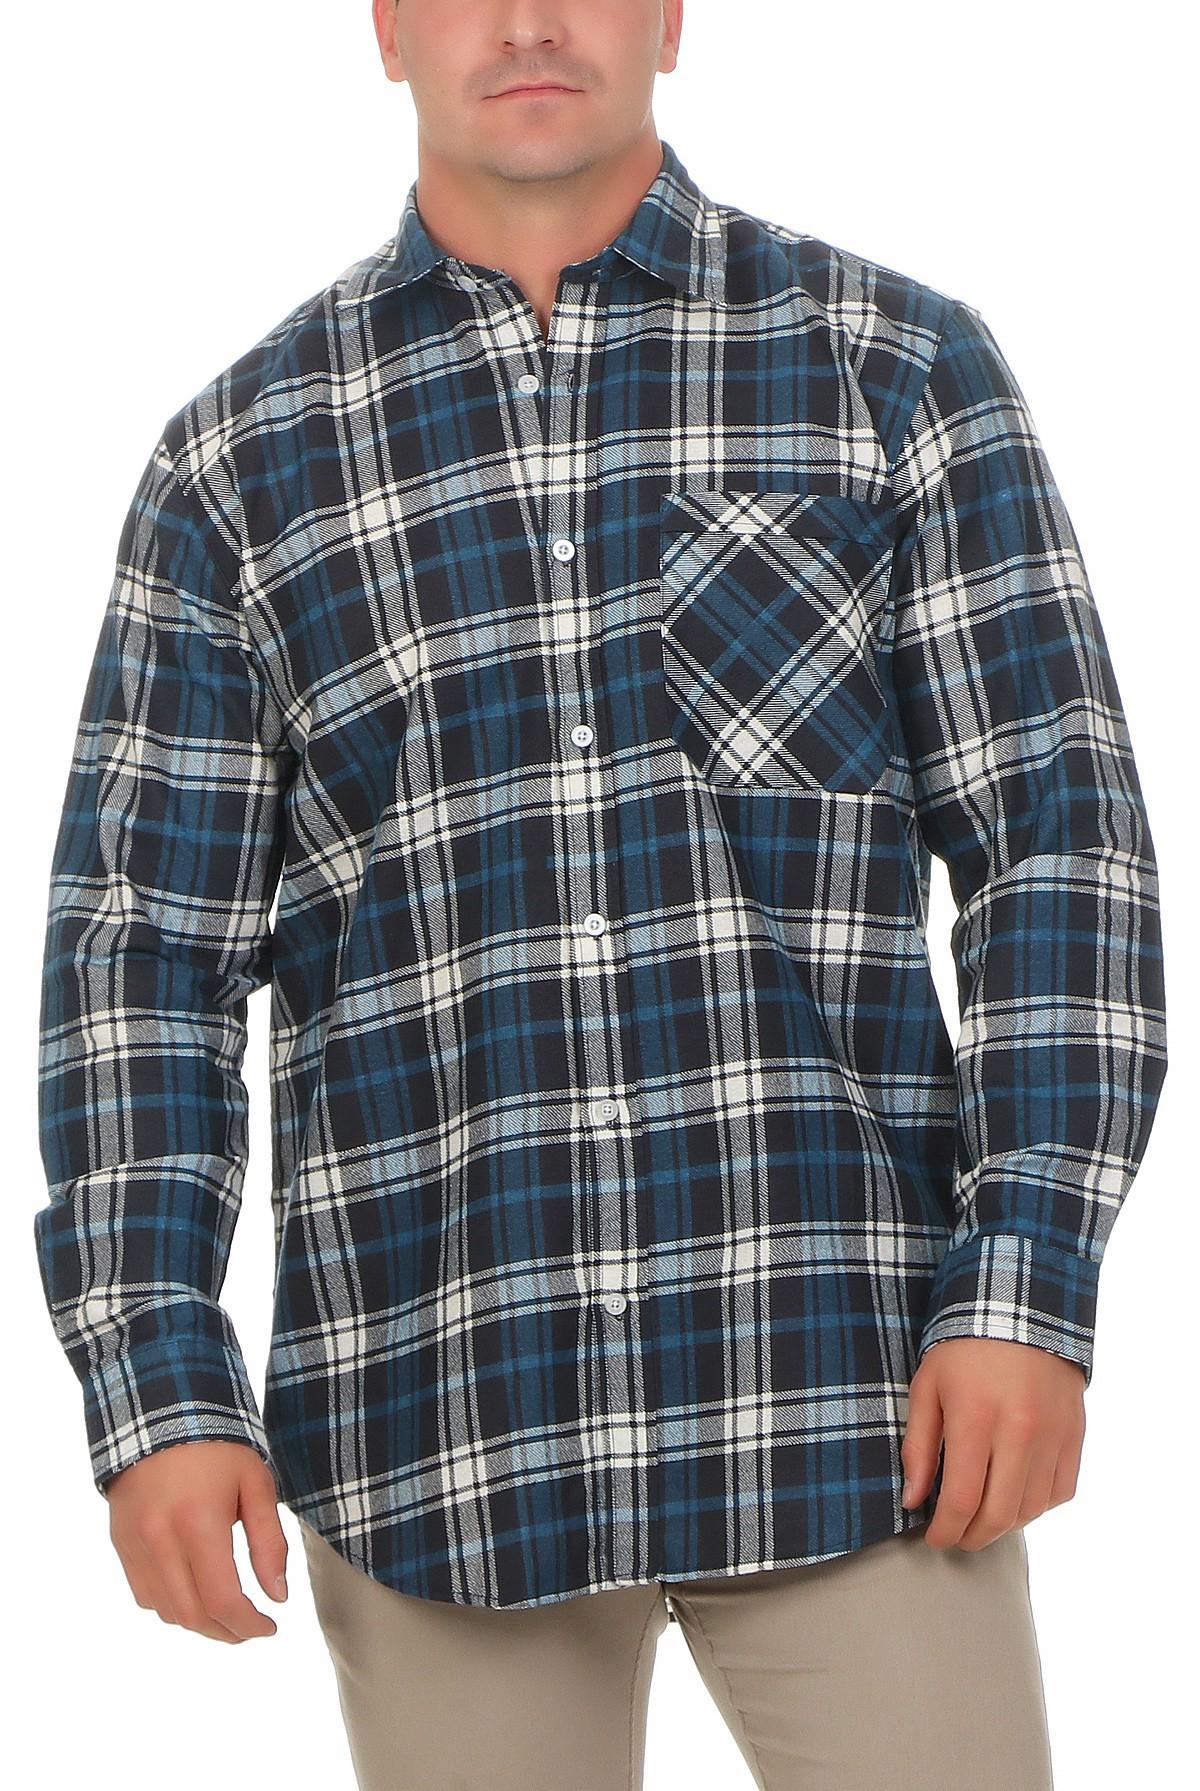 3 Arbeitshemden in Holzfällerkaro-Optik - 85 cm Rückenlänge – Bild 9